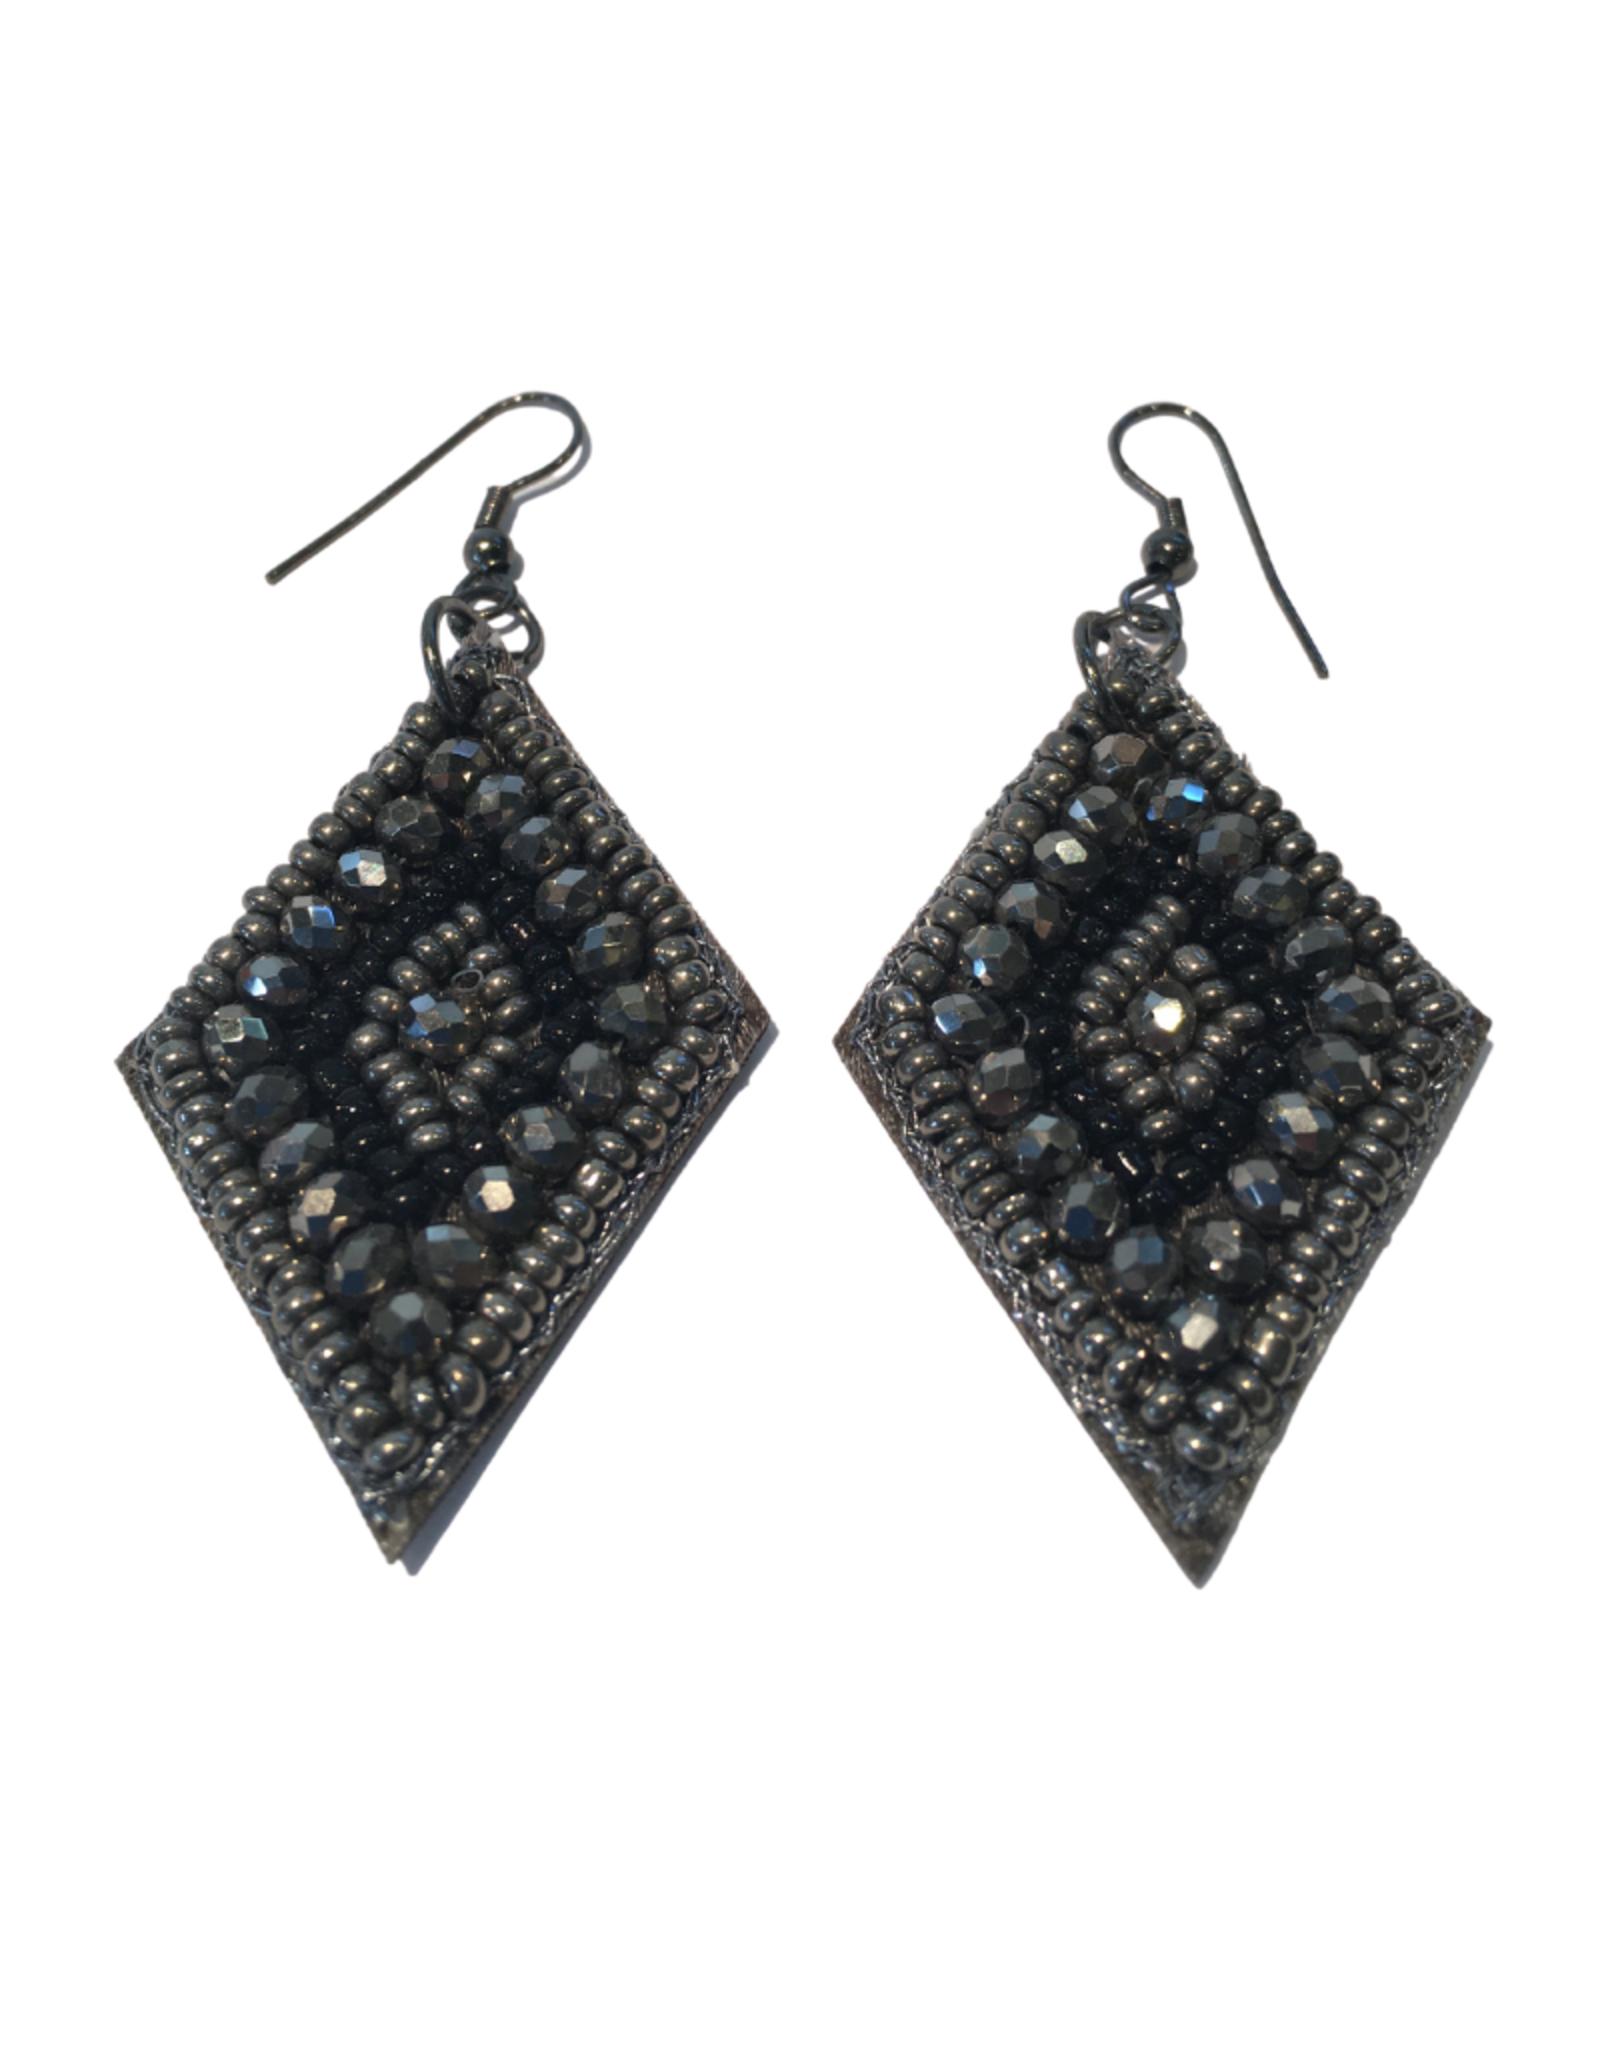 Ten Thousand Villages Black Diamond Shaped Earrings